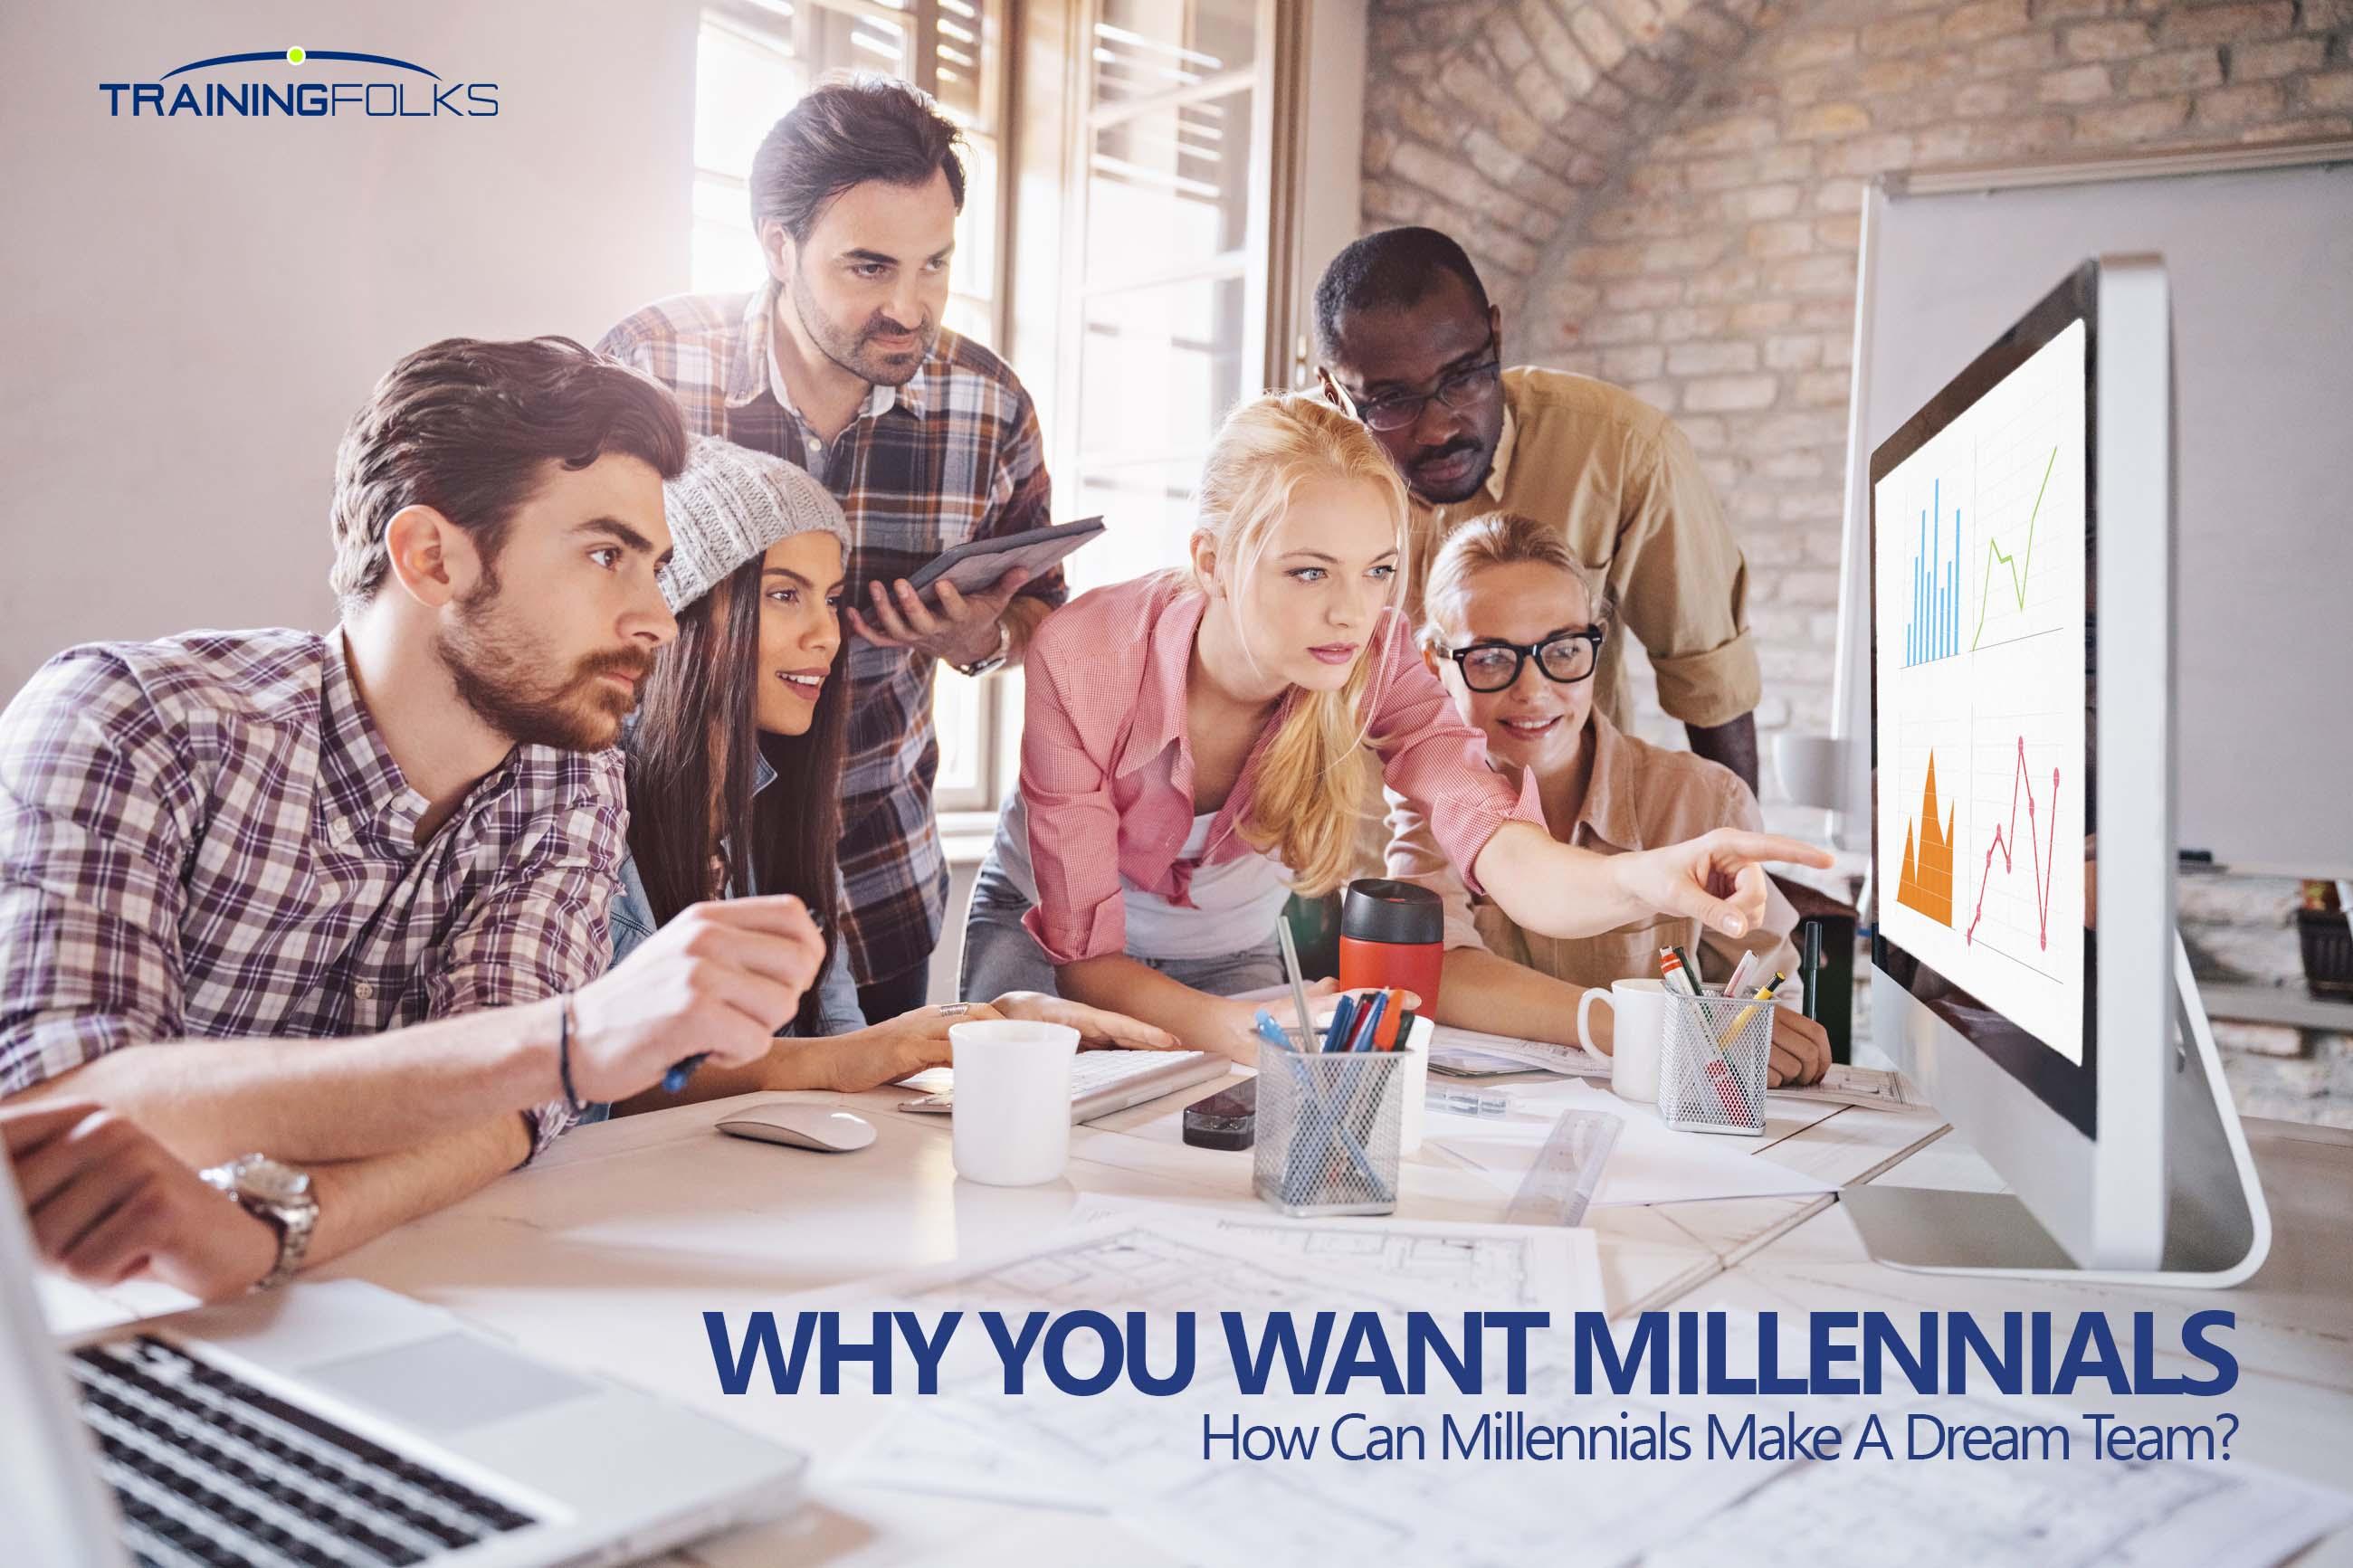 MillennialDreamTeam_TrainingFolks.jpg